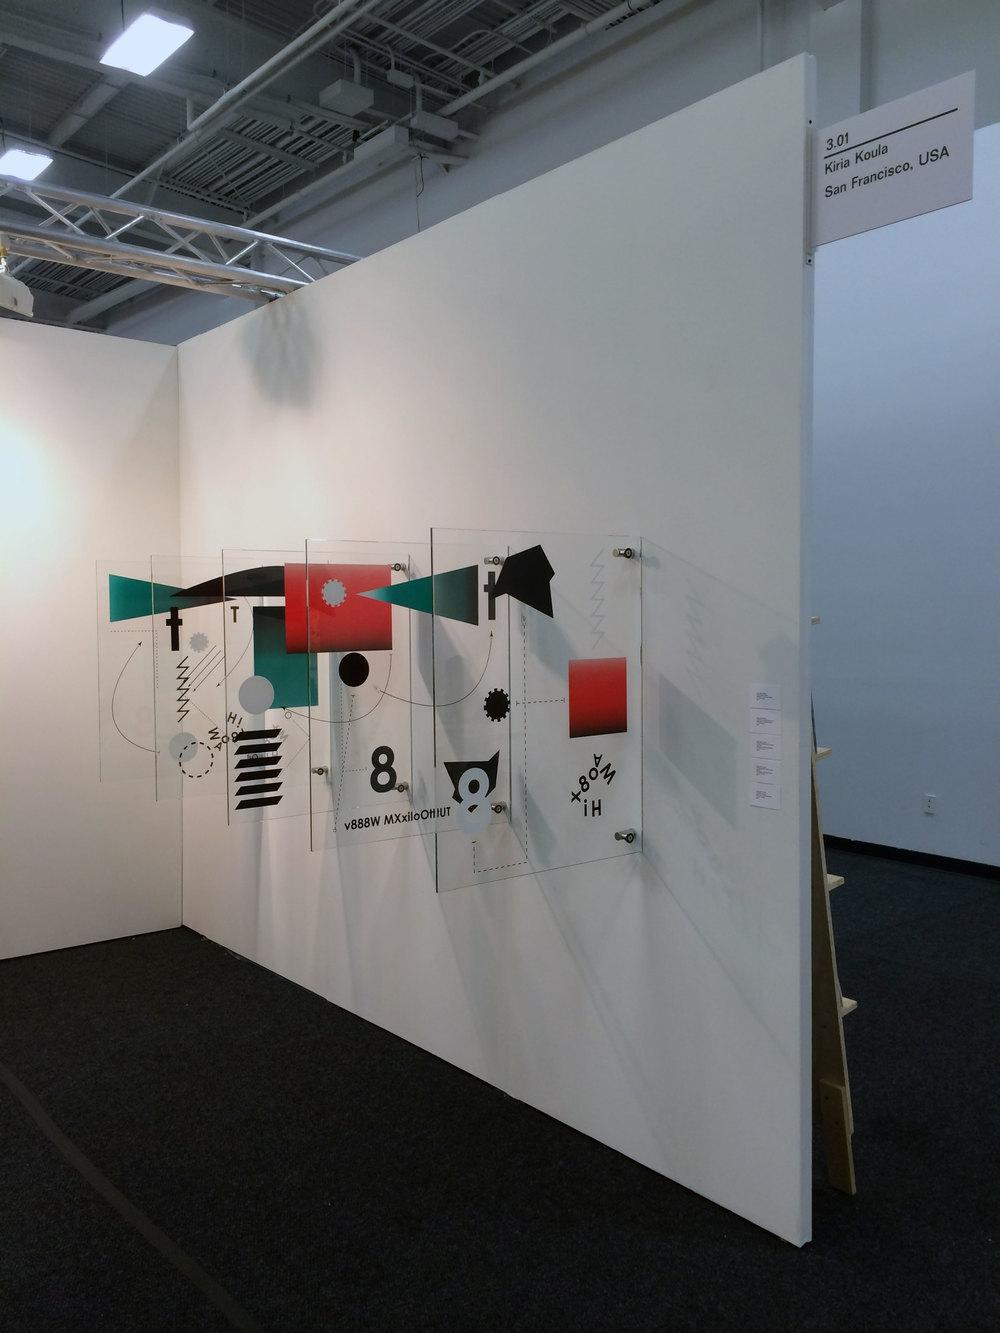 Kiria Koula Gallery –Jose Leon Cerrillo